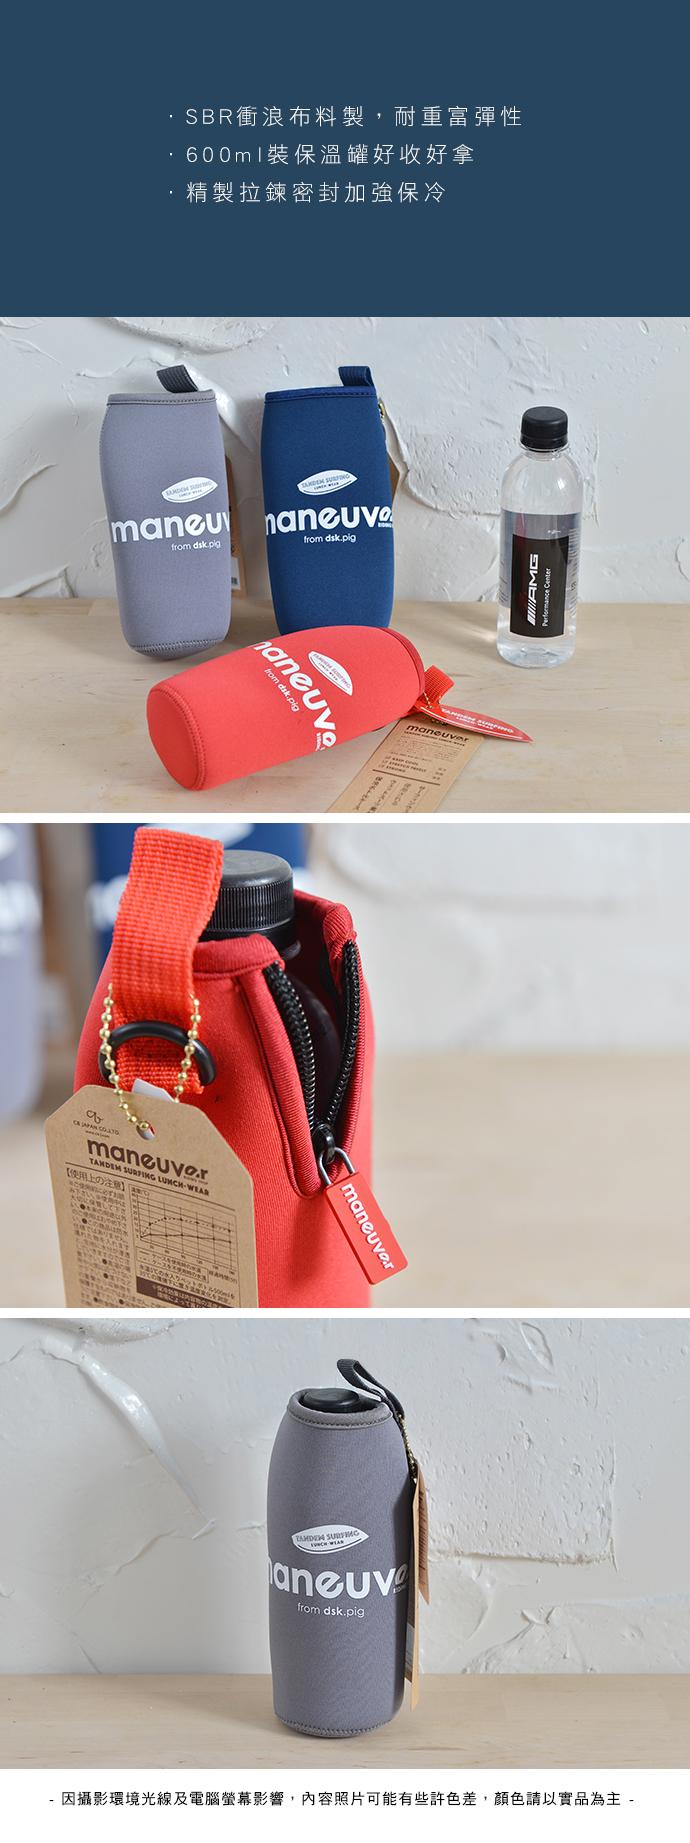 CB Japan|海洋系列保冷手提水壺袋 - 時尚灰